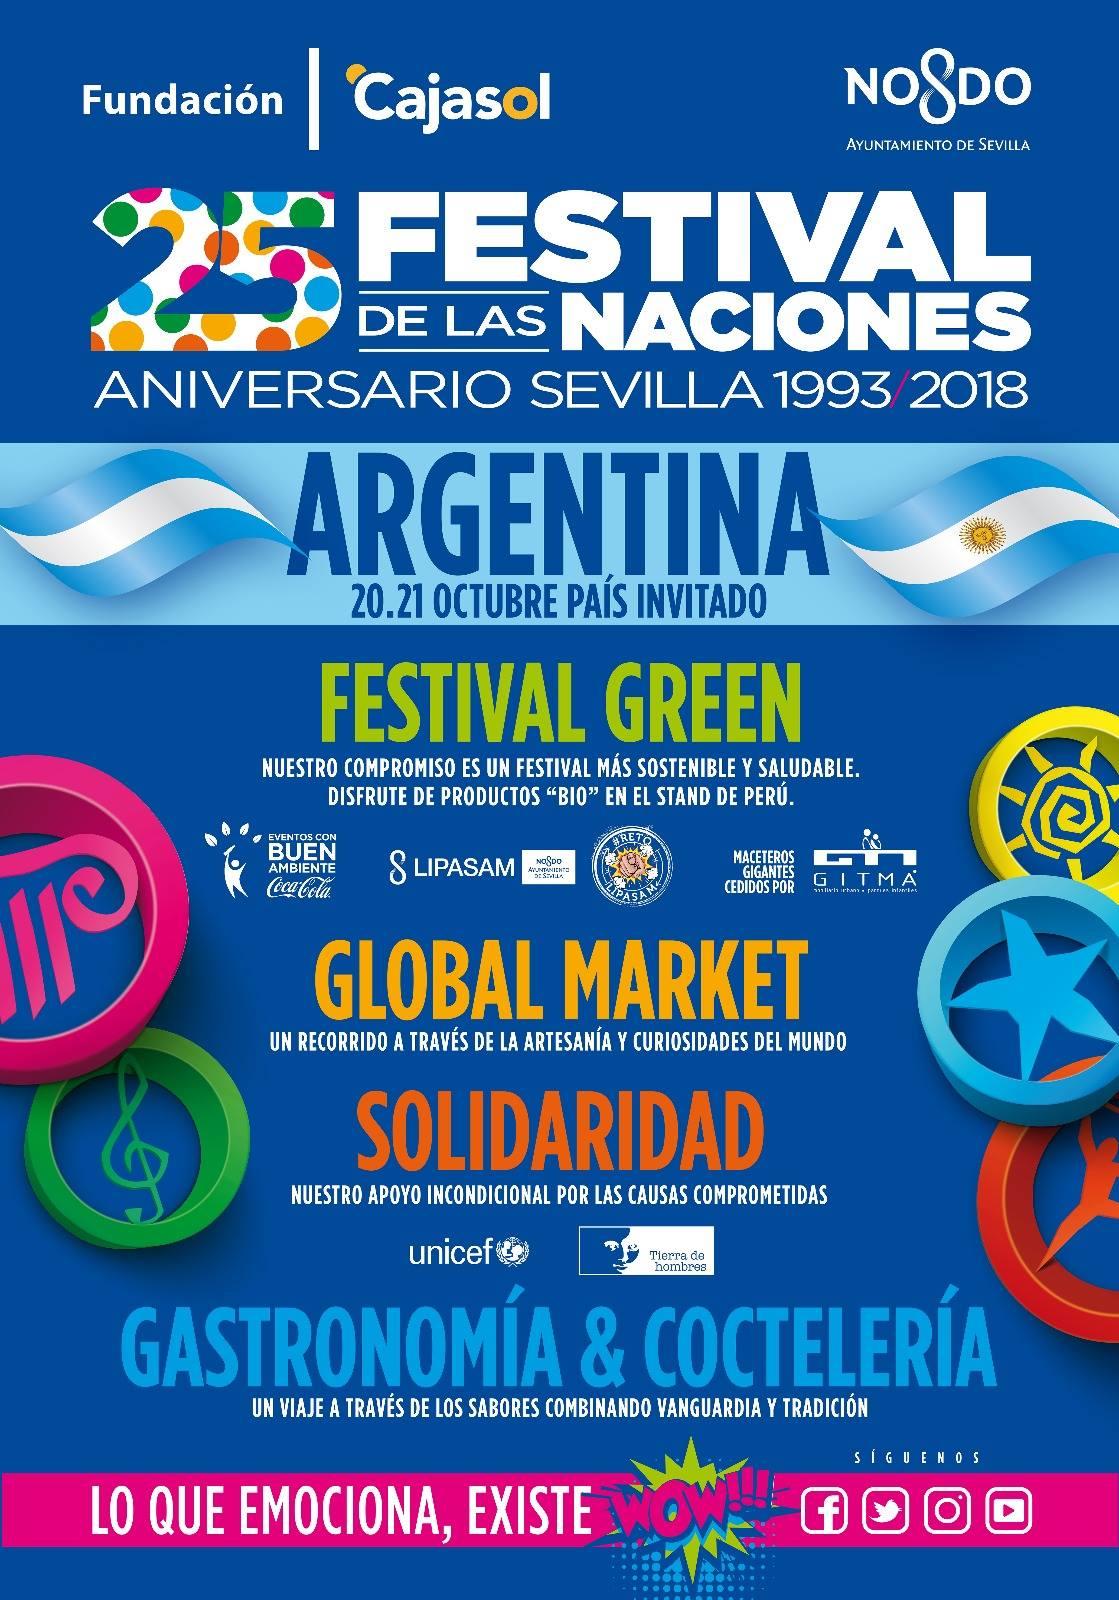 festival-naciones-sevilla